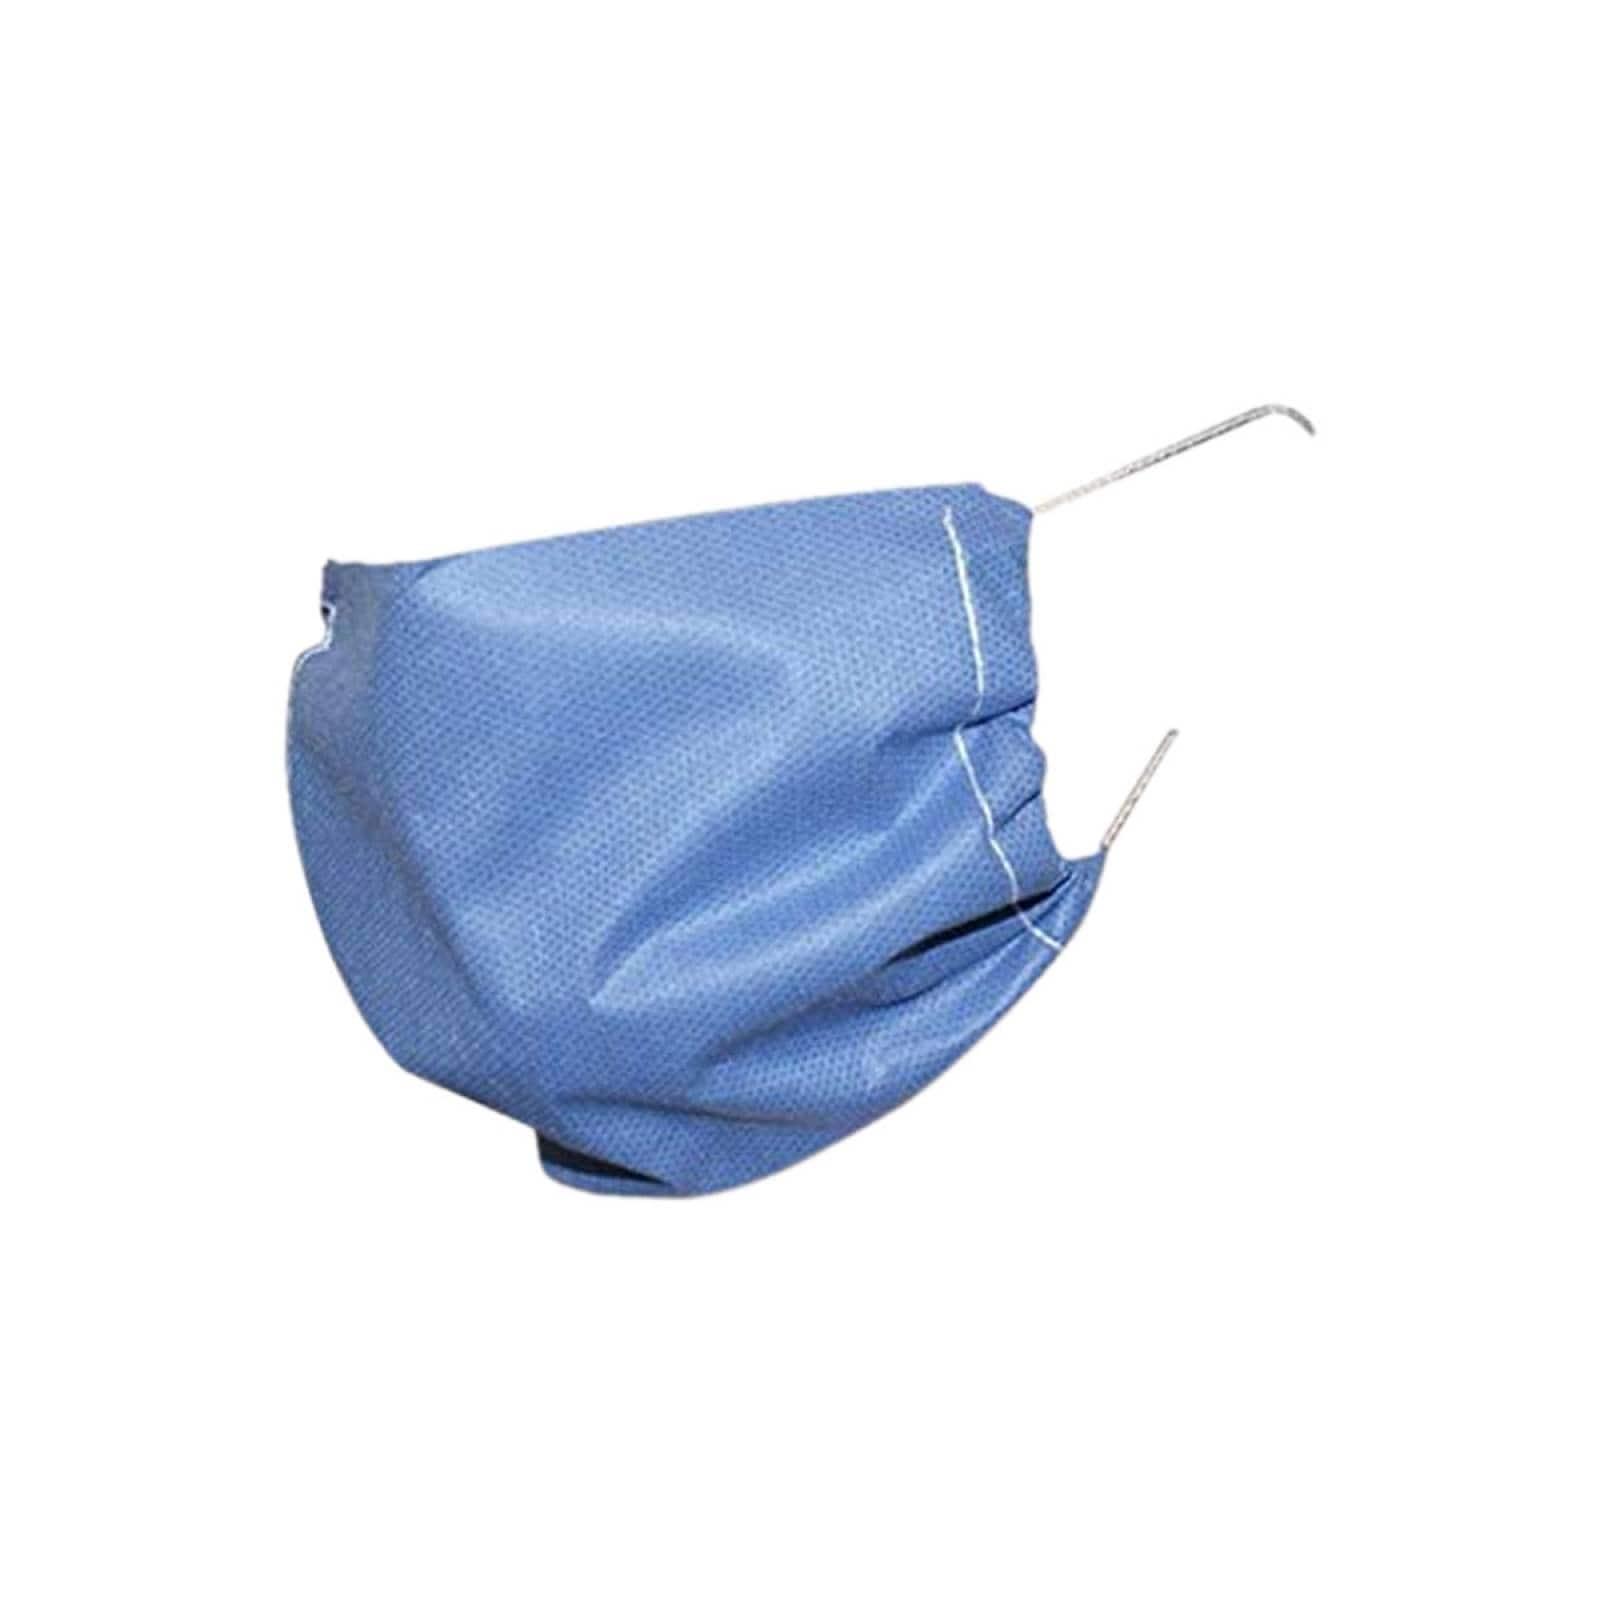 Mascarilla Cubrebocas 2 Capas Azul Preventivo Medico 100 Pzs